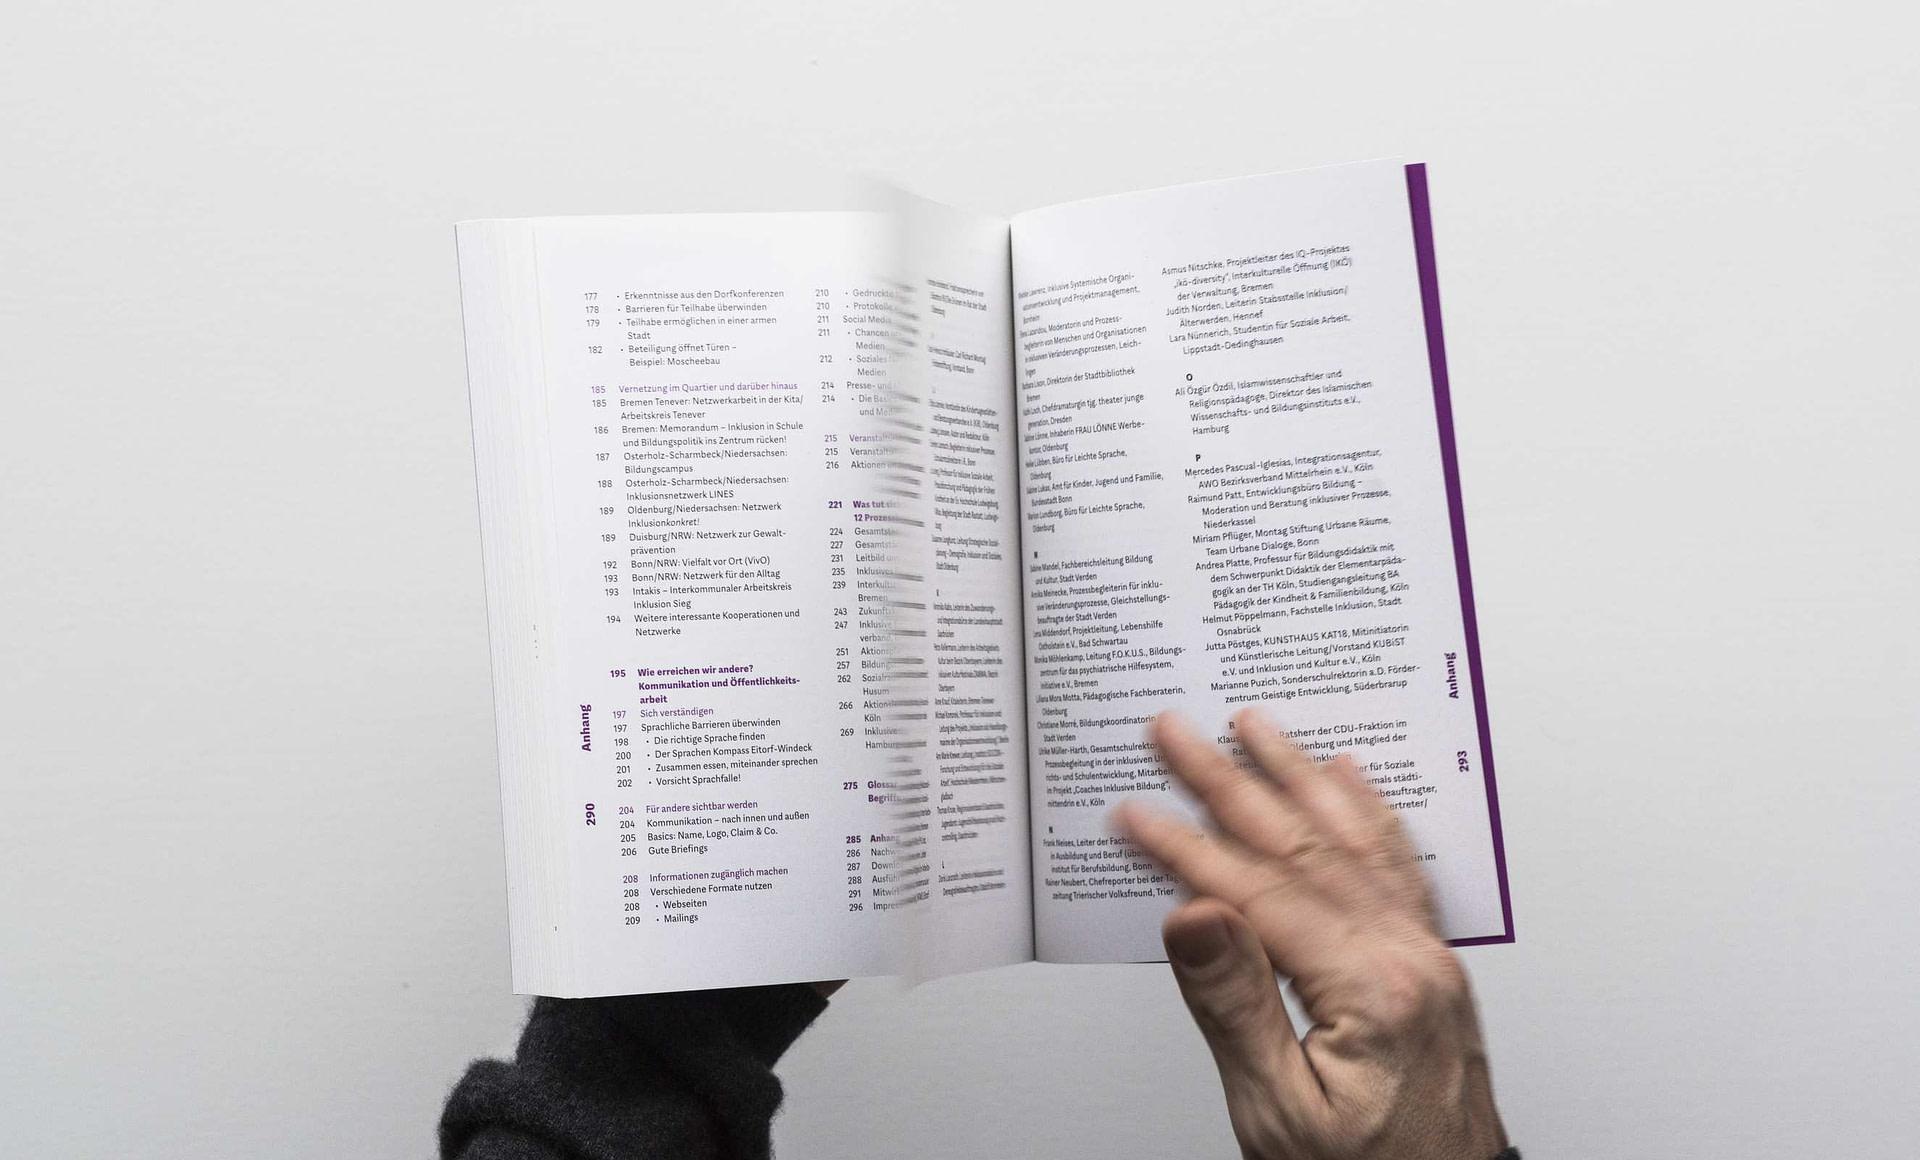 inclusion-fieldbook-26-2650x1600px